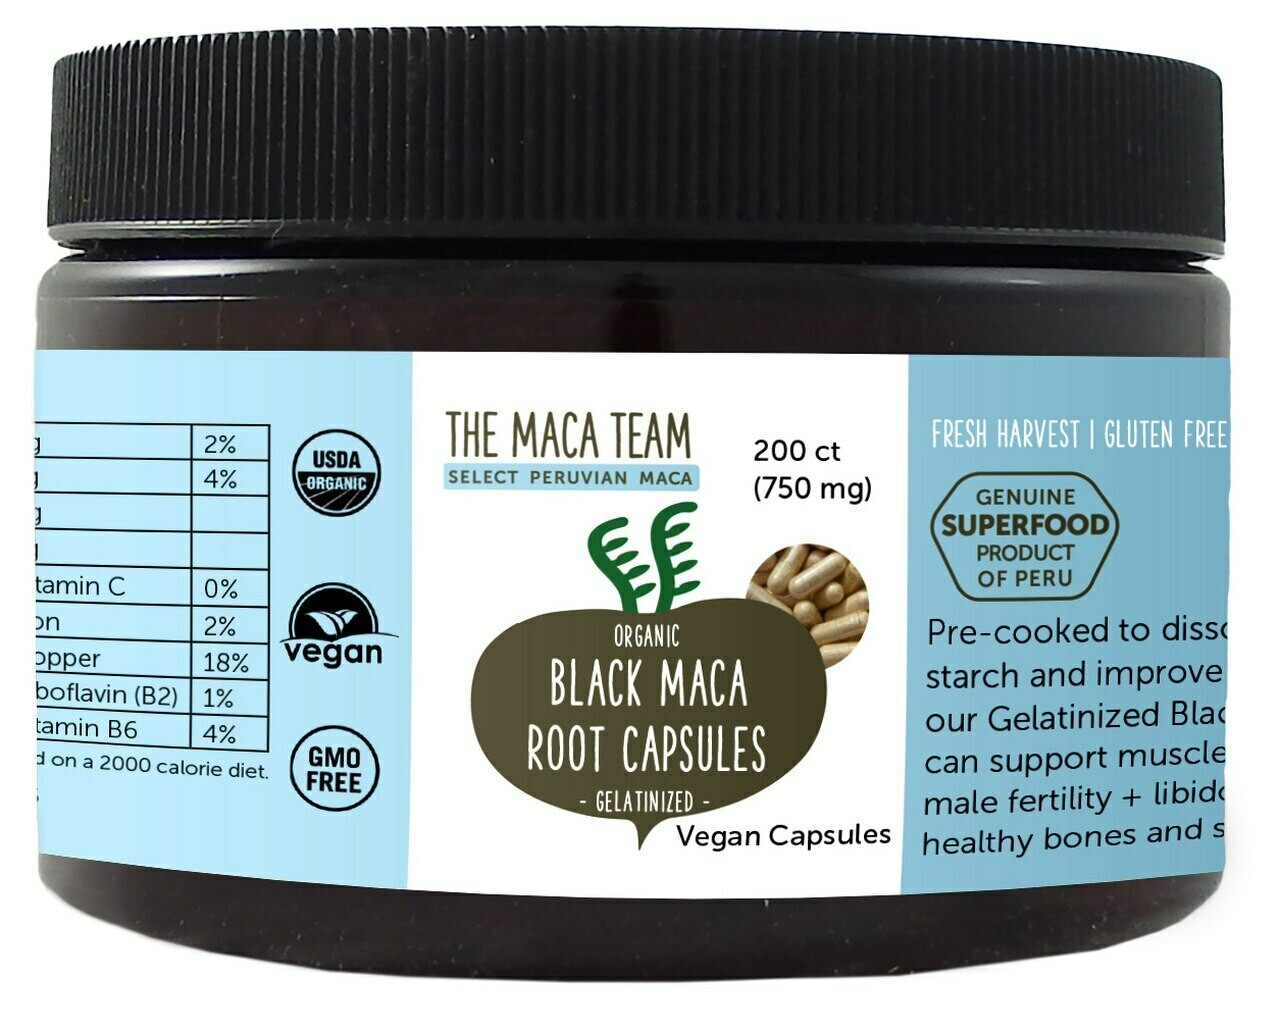 Organic Gelatinized Black Maca Capsules - Vegan - 750 mg - 200 ct